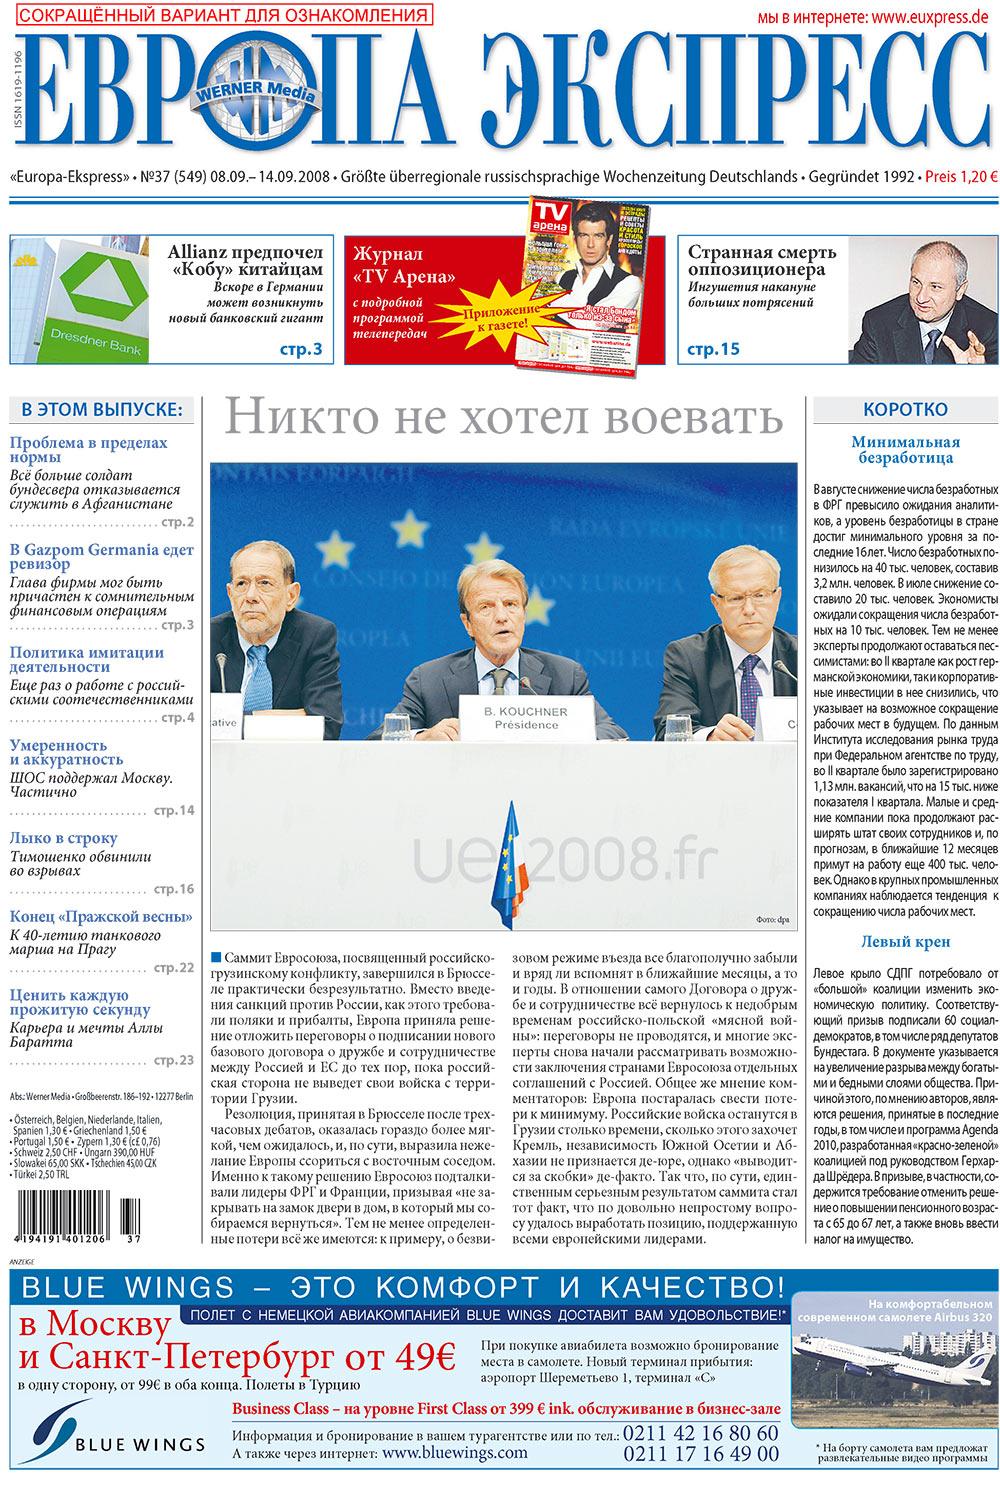 Европа экспресс (газета). 2008 год, номер 37, стр. 1